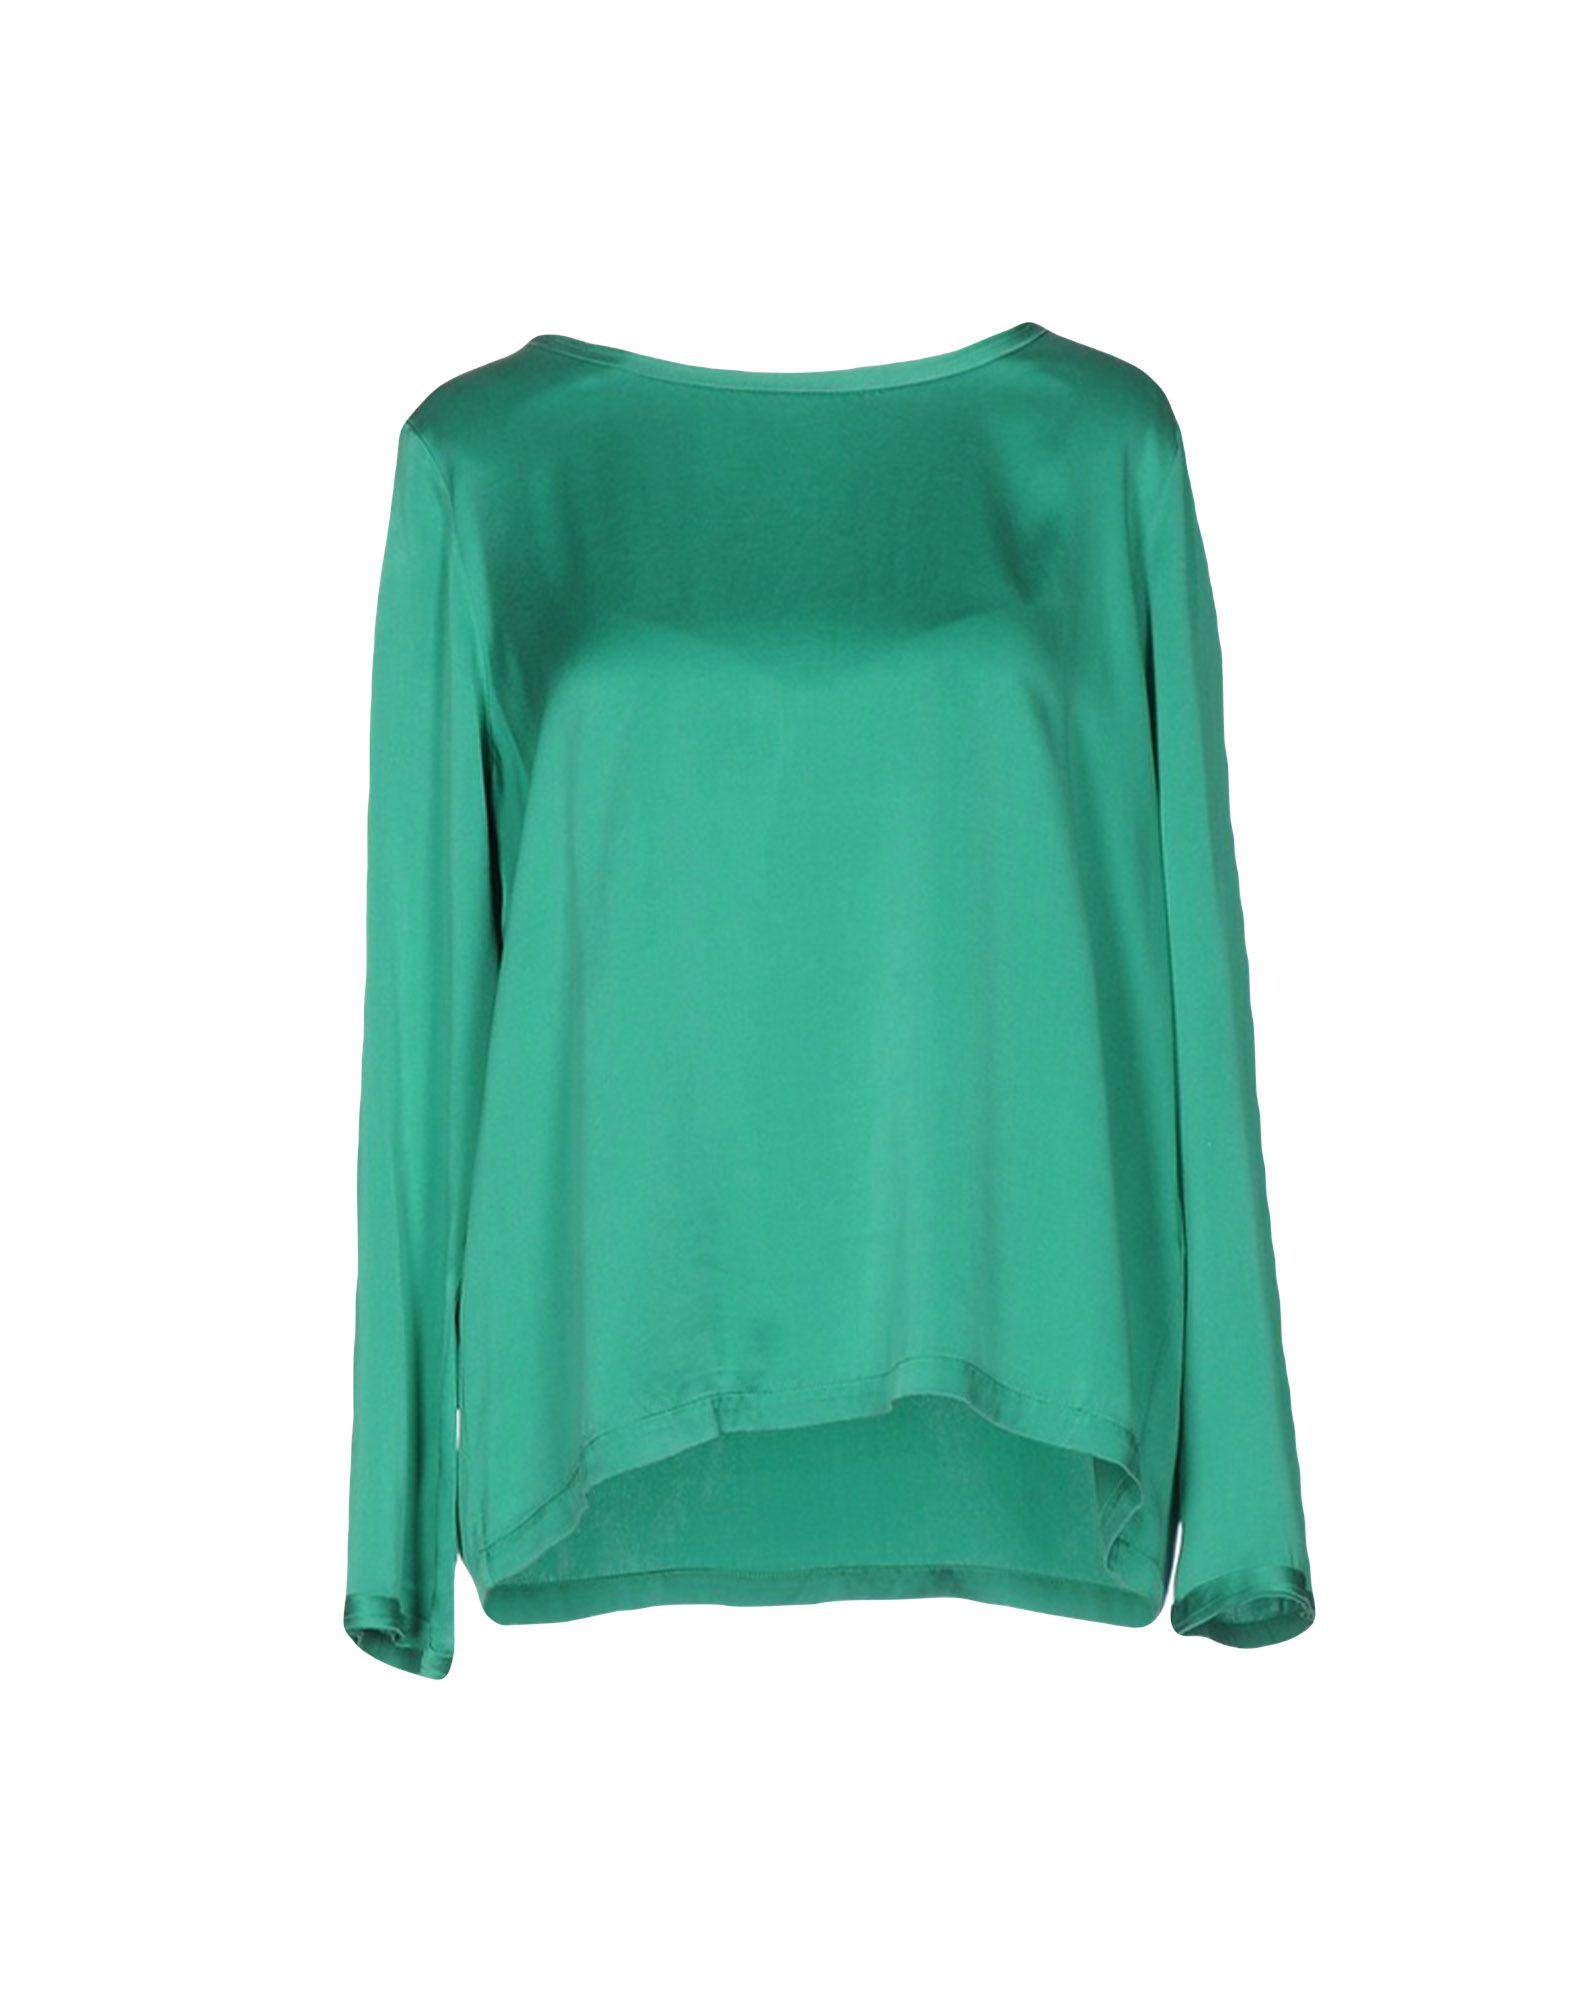 FIRIS Damen Bluse Farbe Grün Größe 5 jetztbilligerkaufen